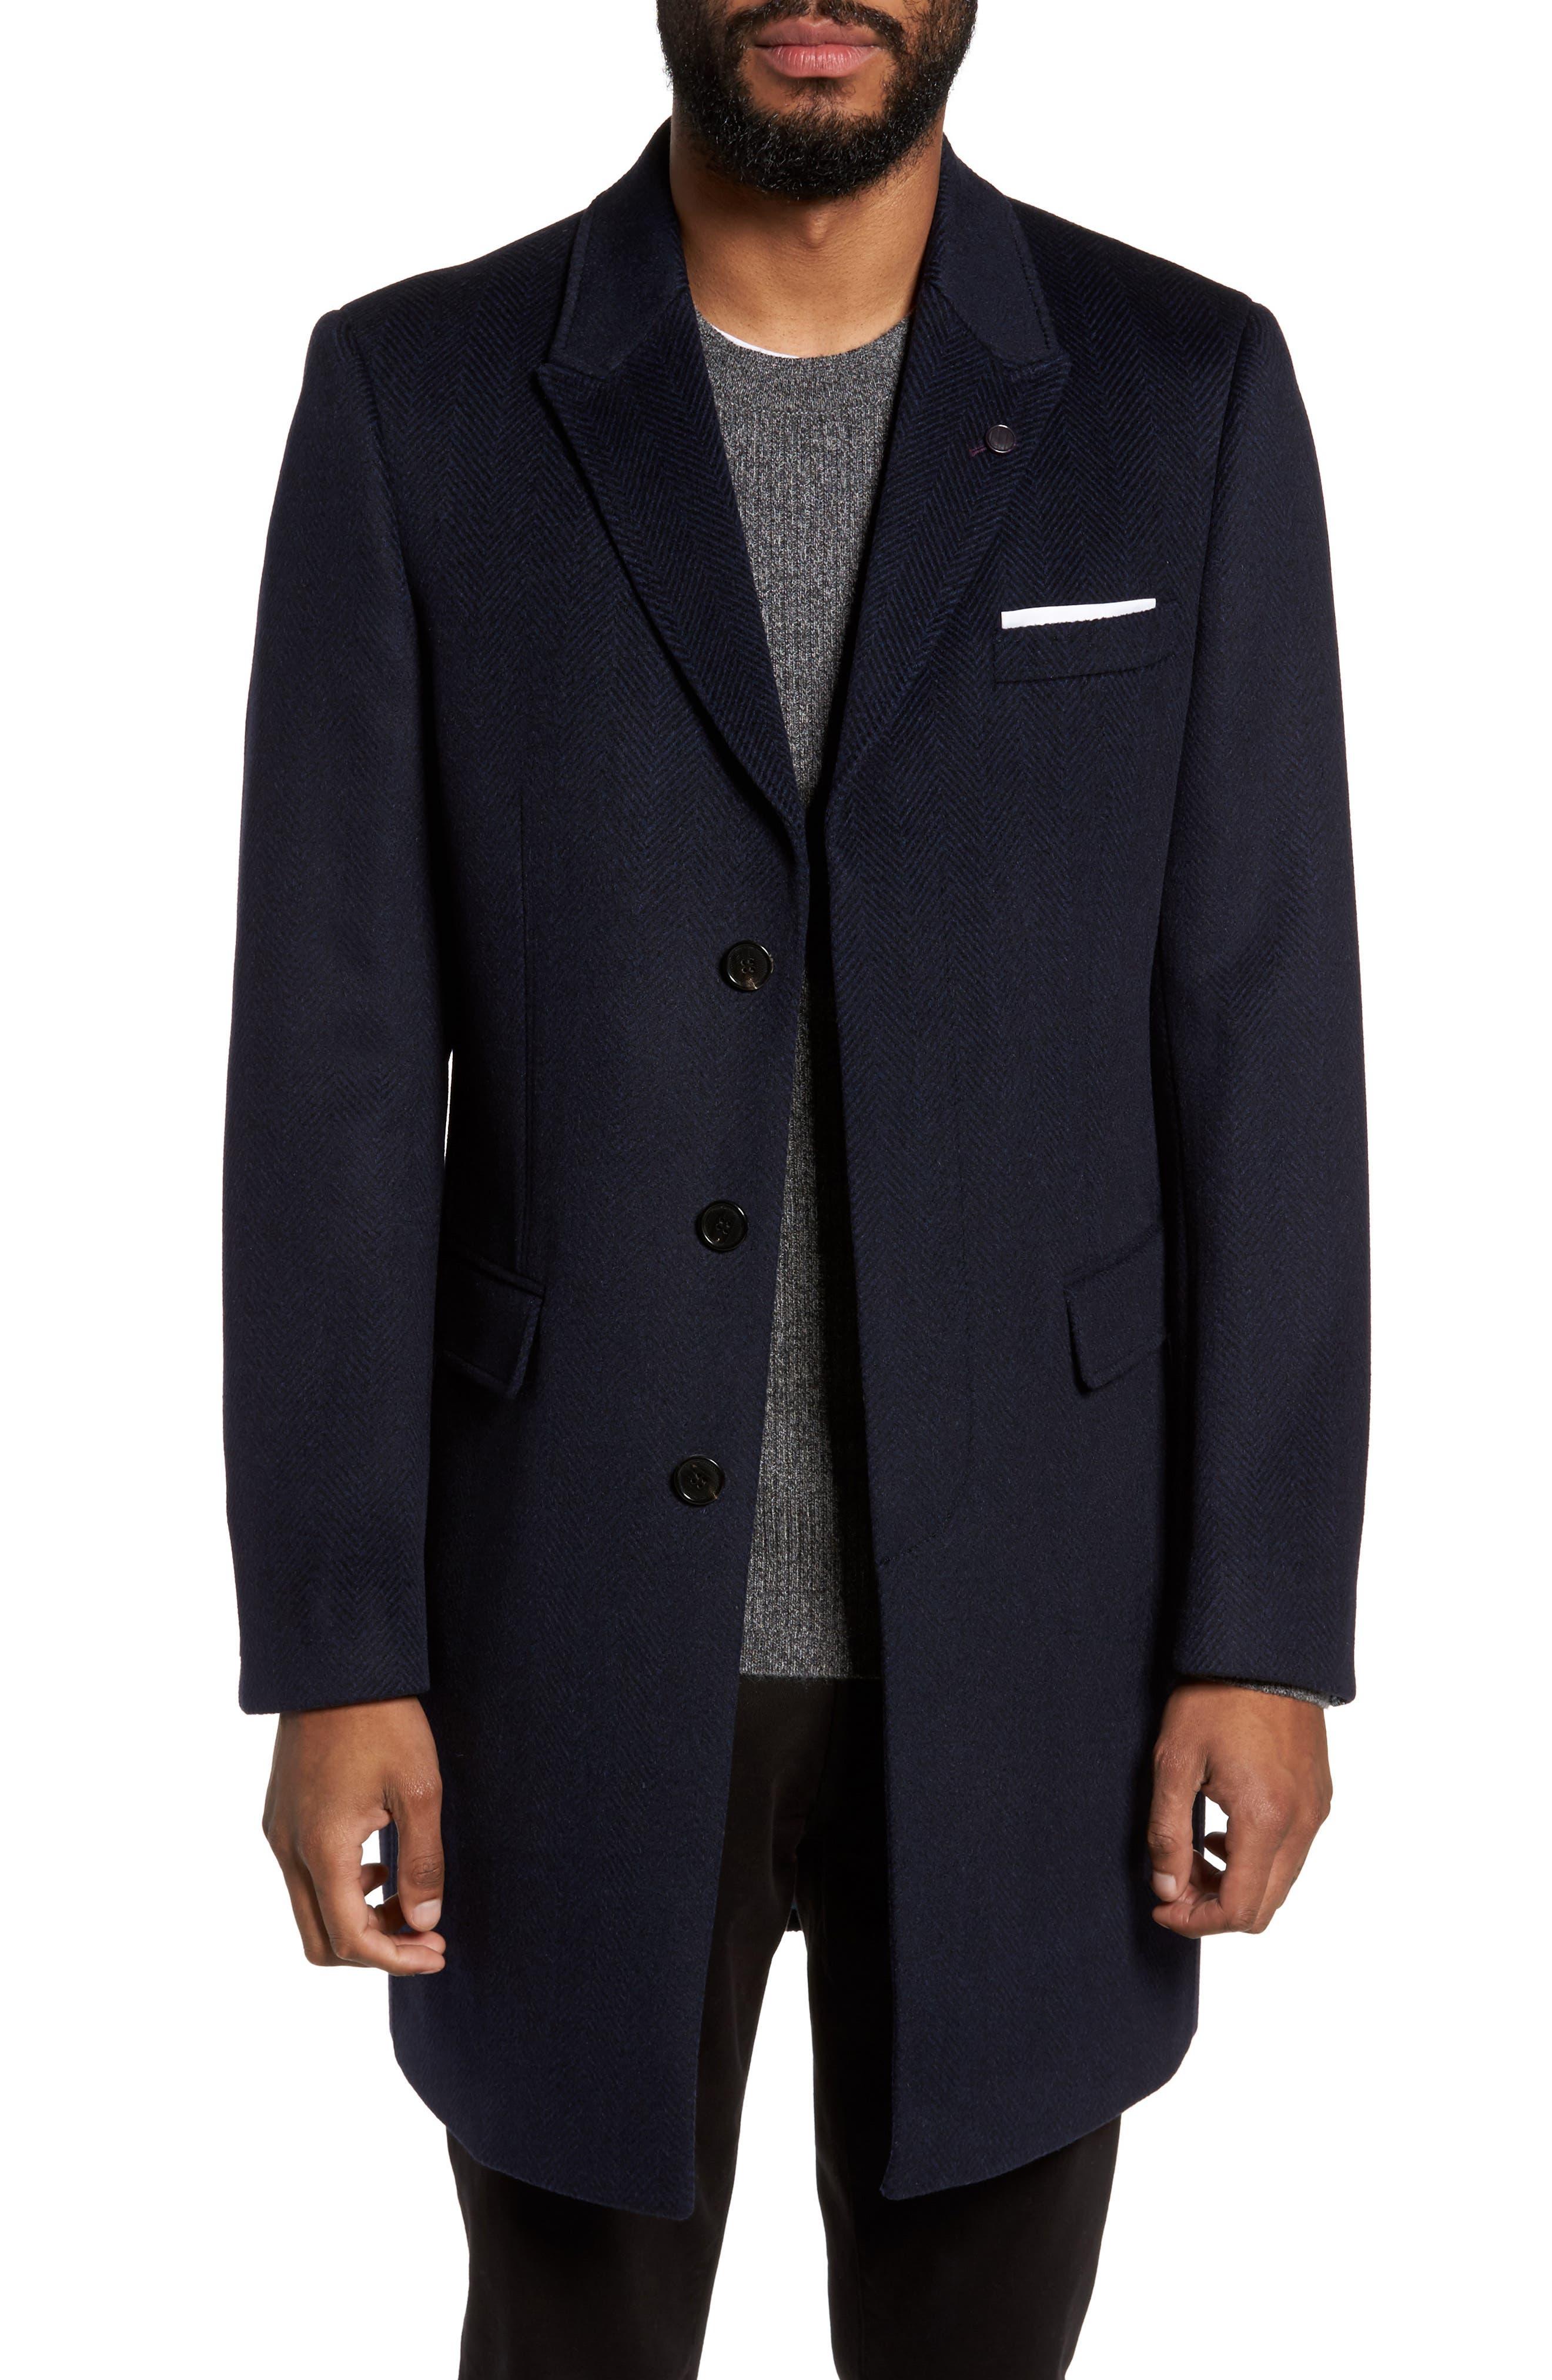 Ted Baker London Endurance Wool & Cashmere Overcoat